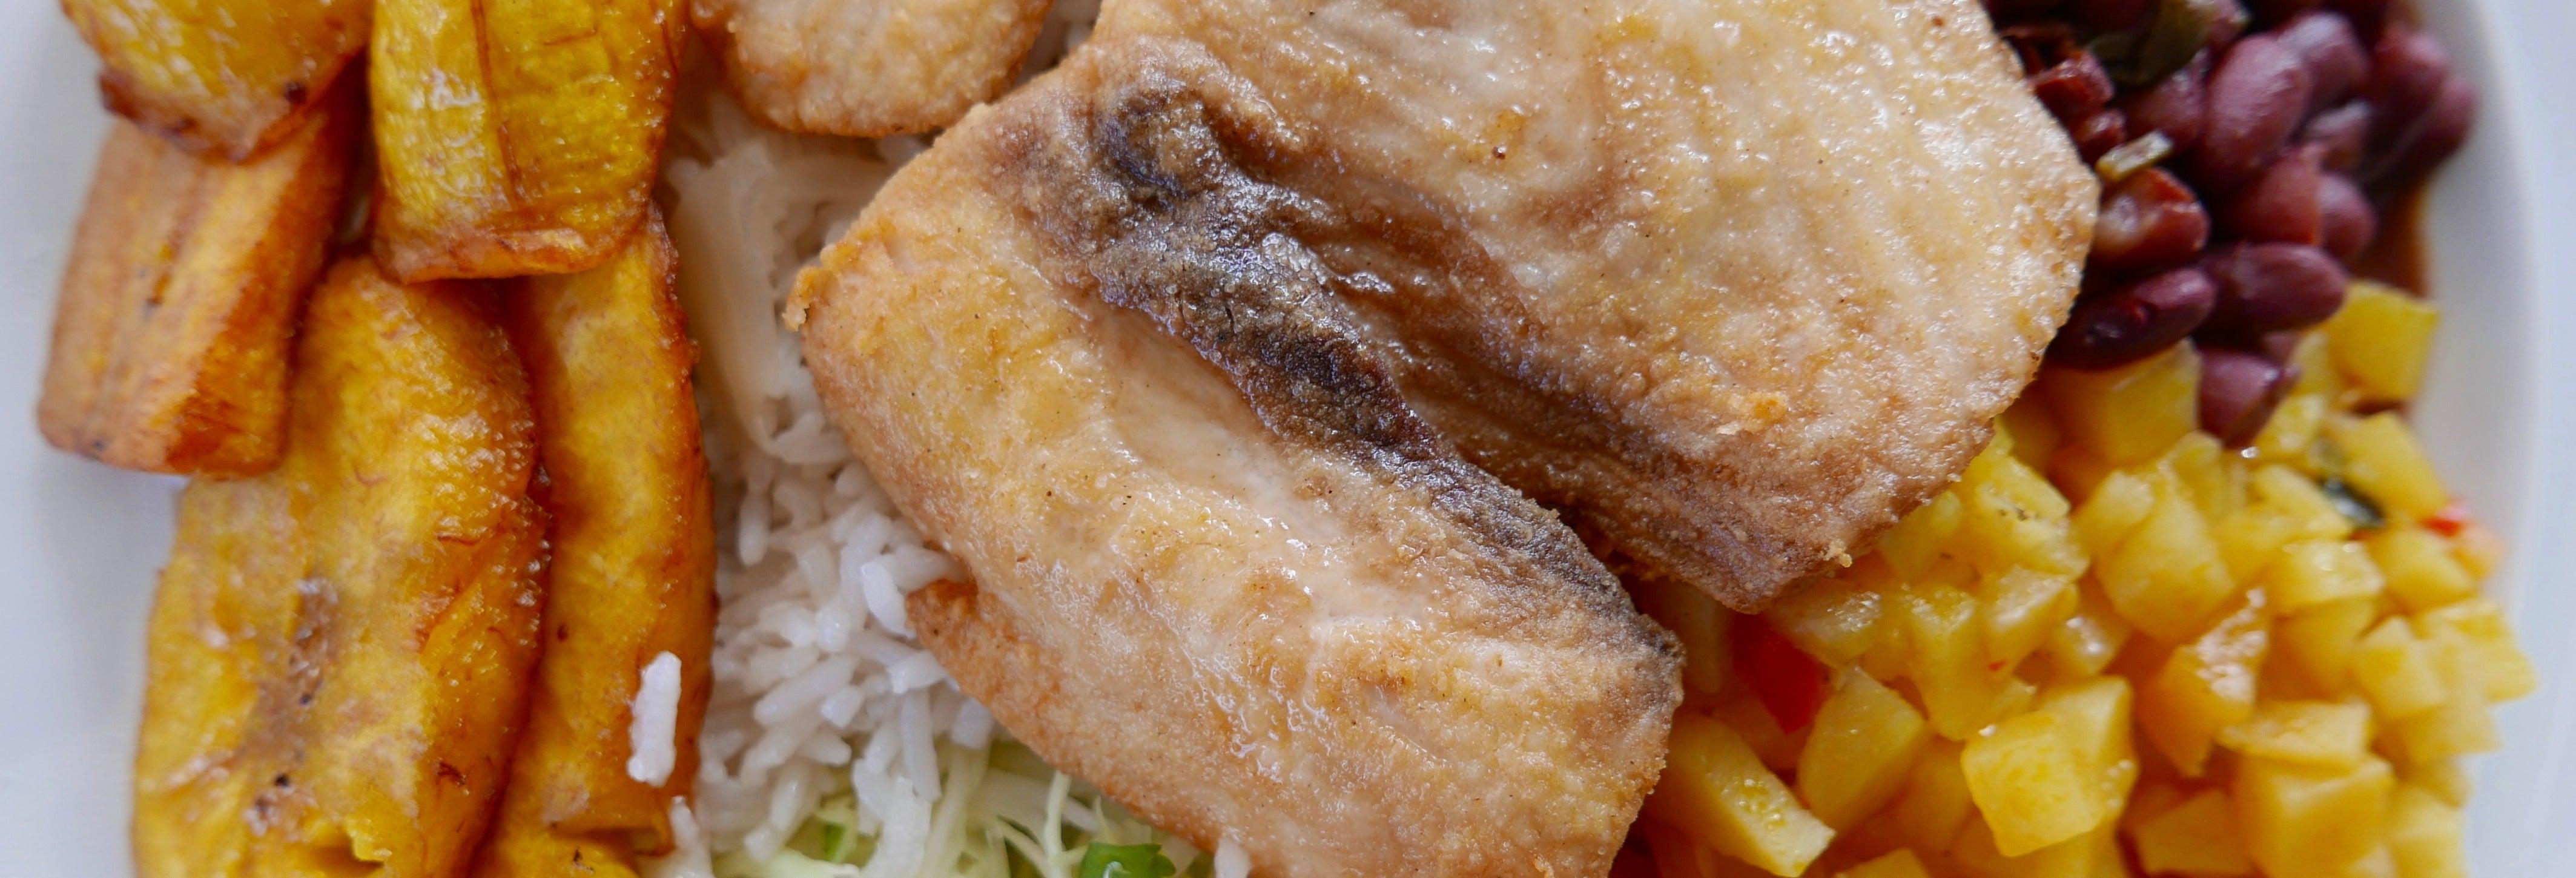 Tour gastronômico por San José